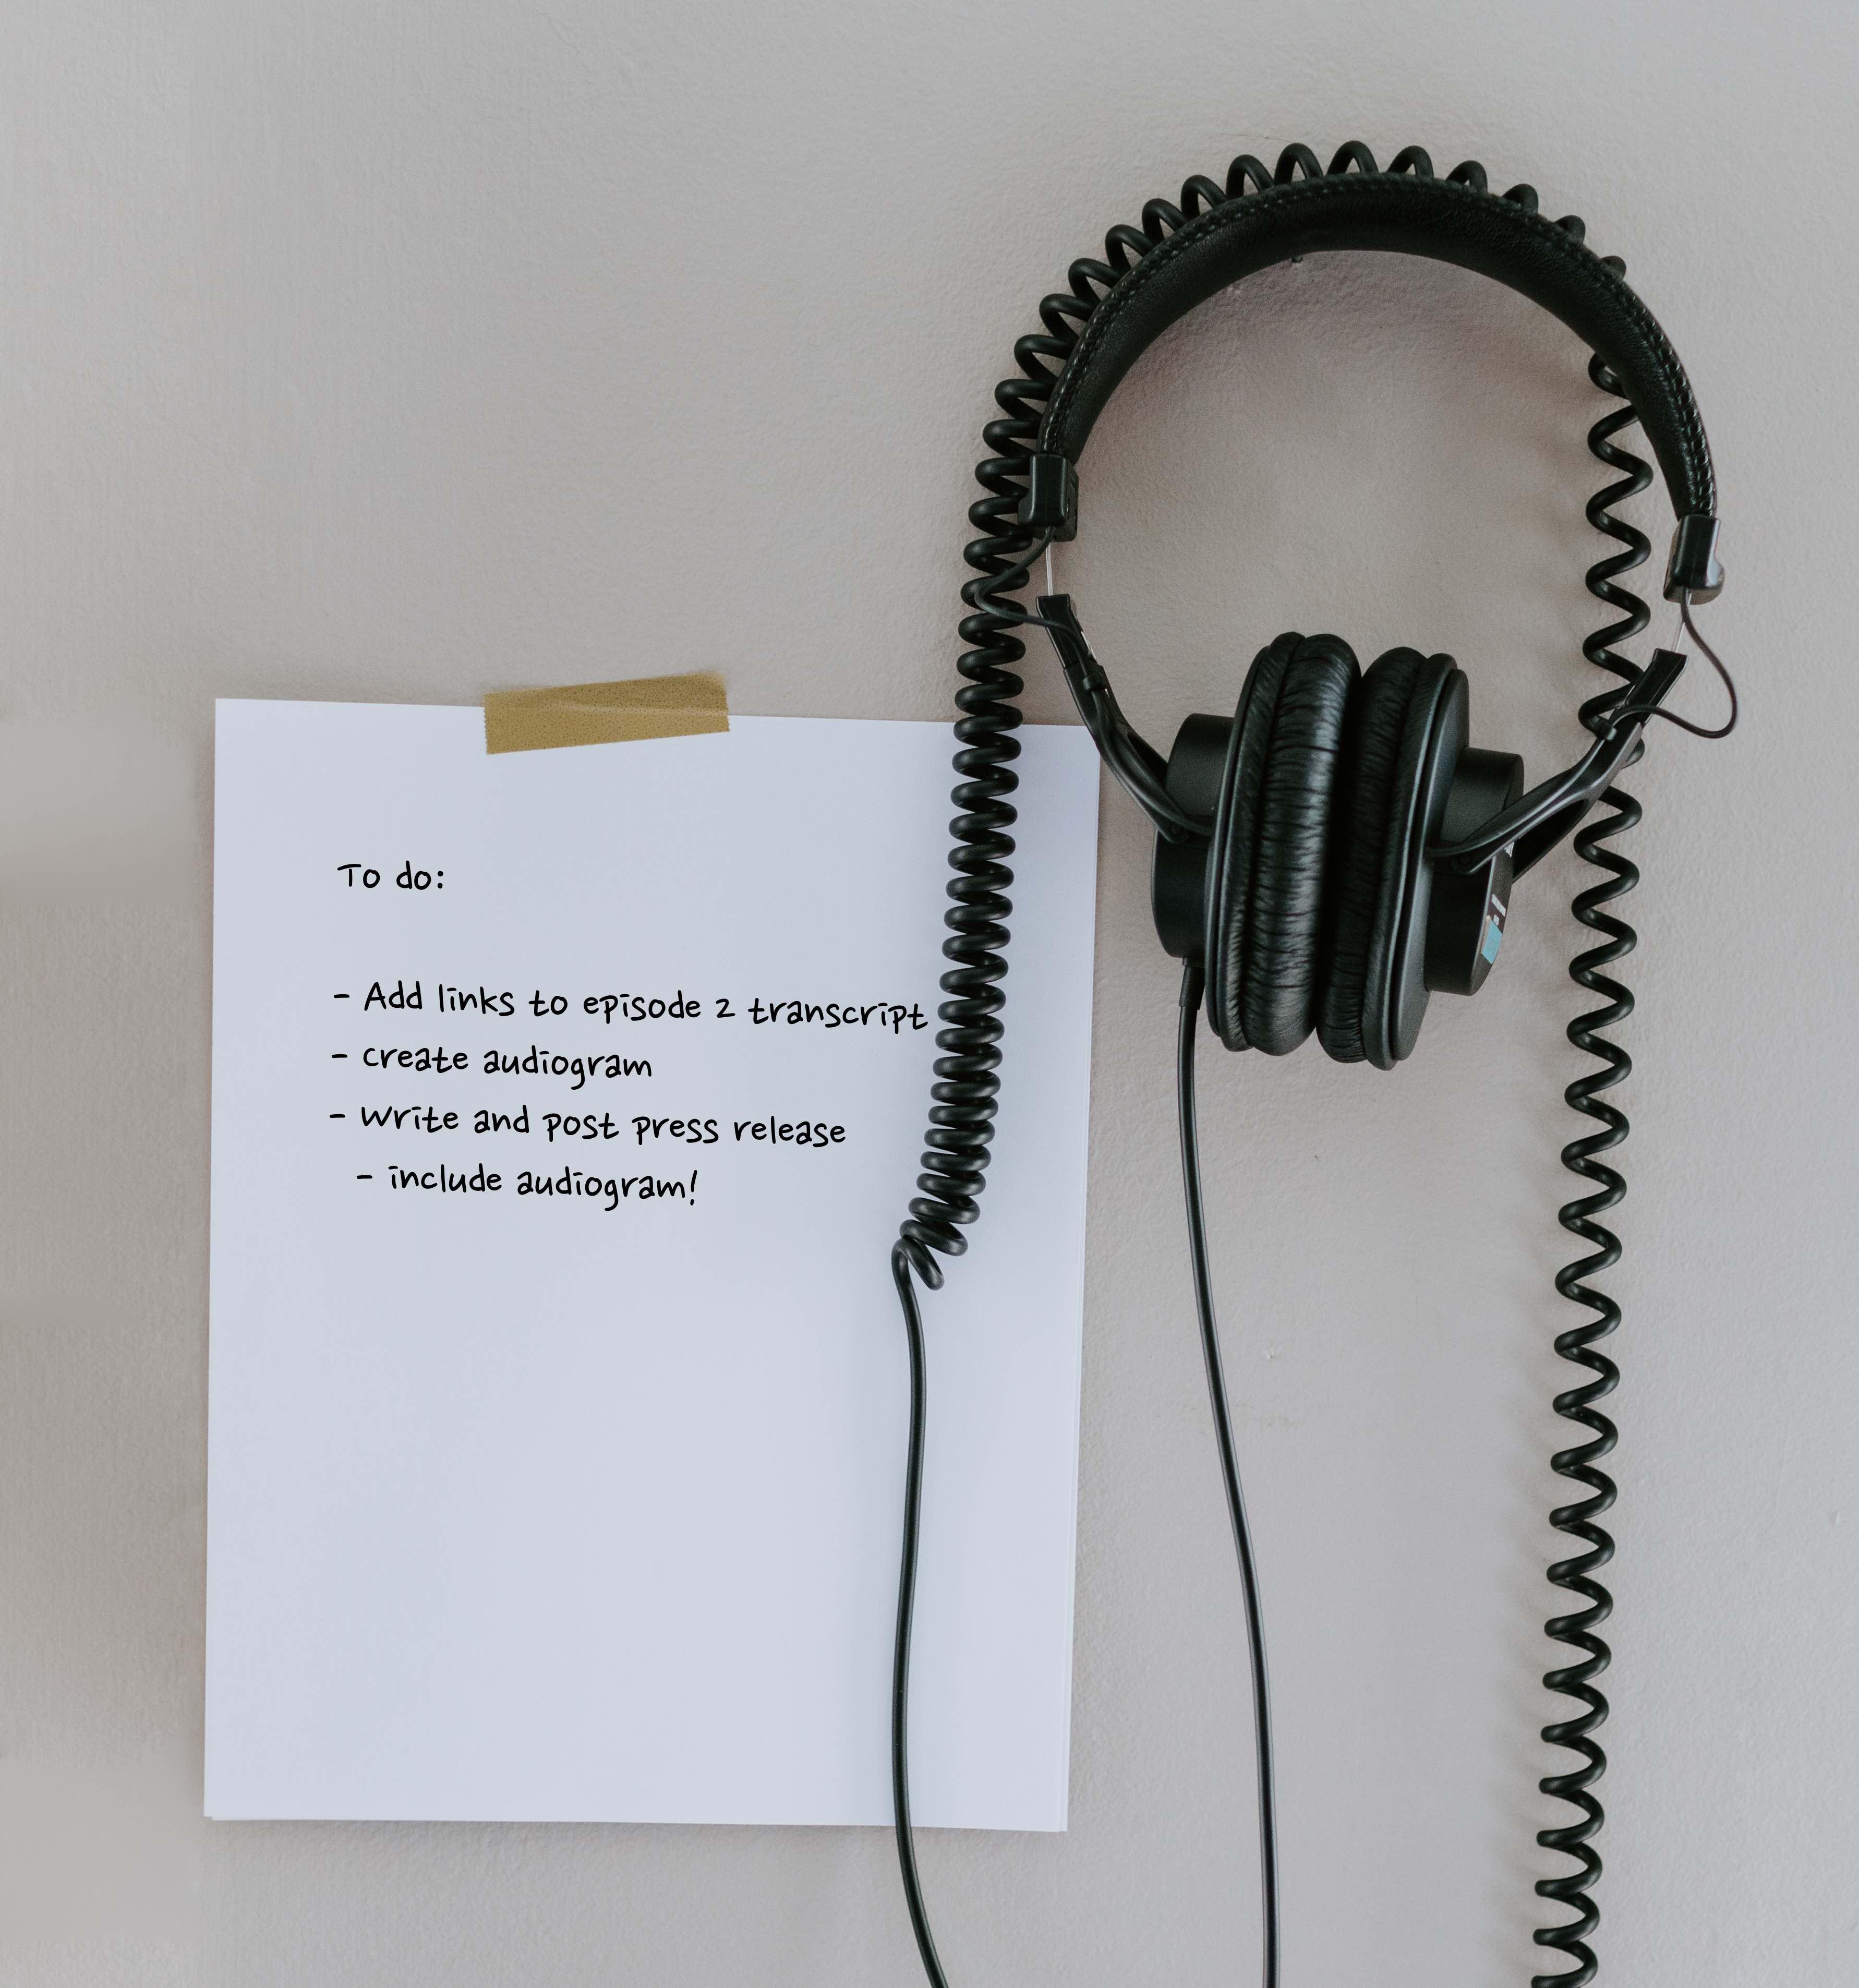 audio-article-to-do-list.jpg